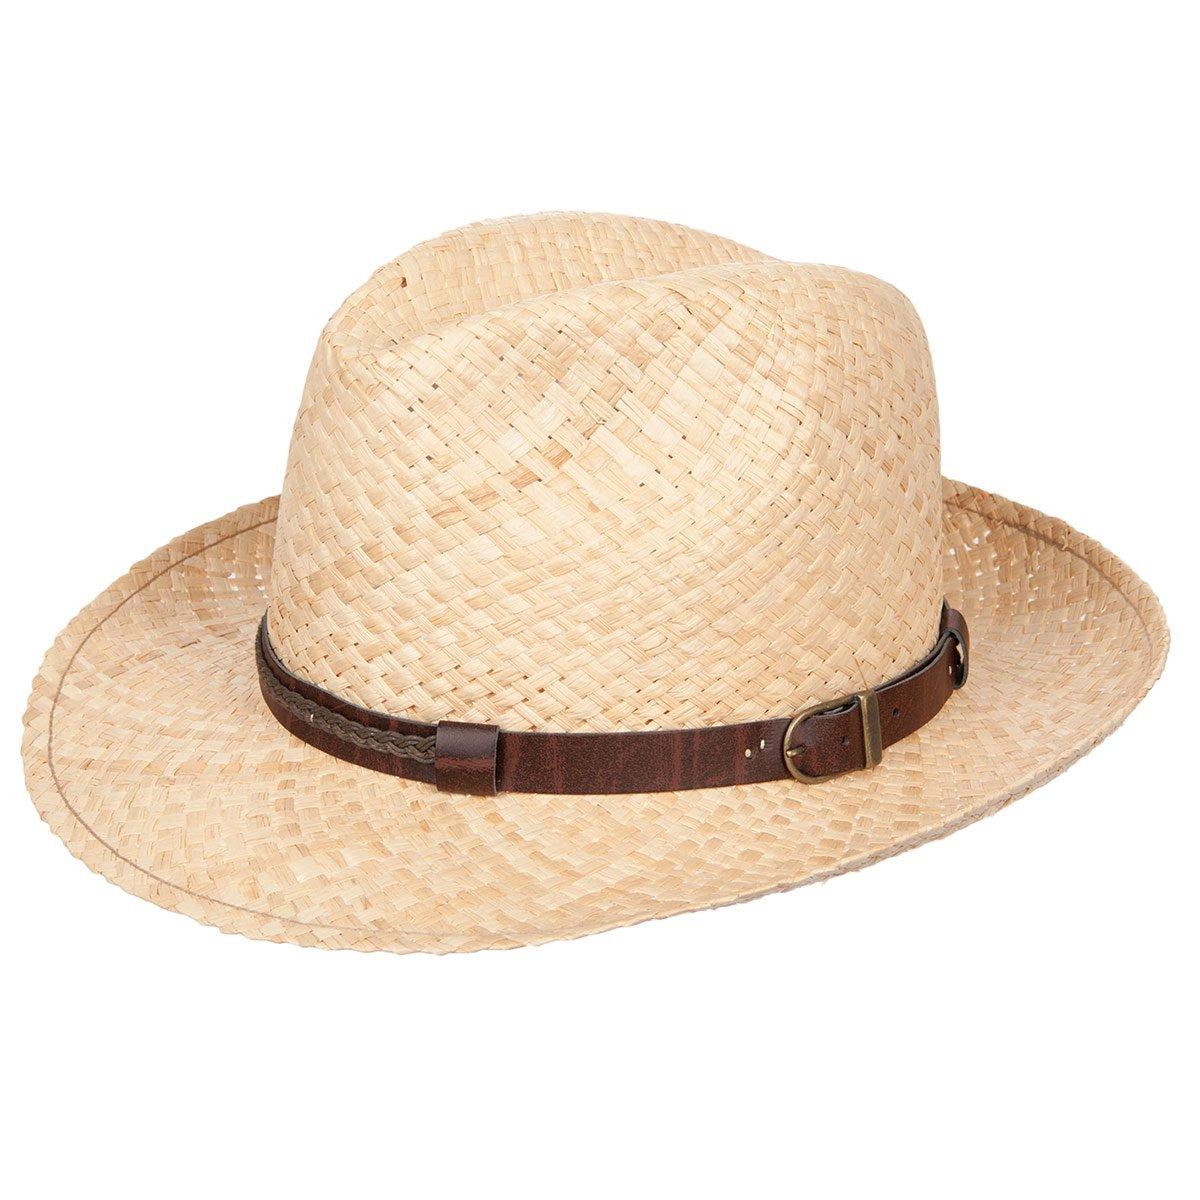 2cda1d43 Straw hat by Hutter